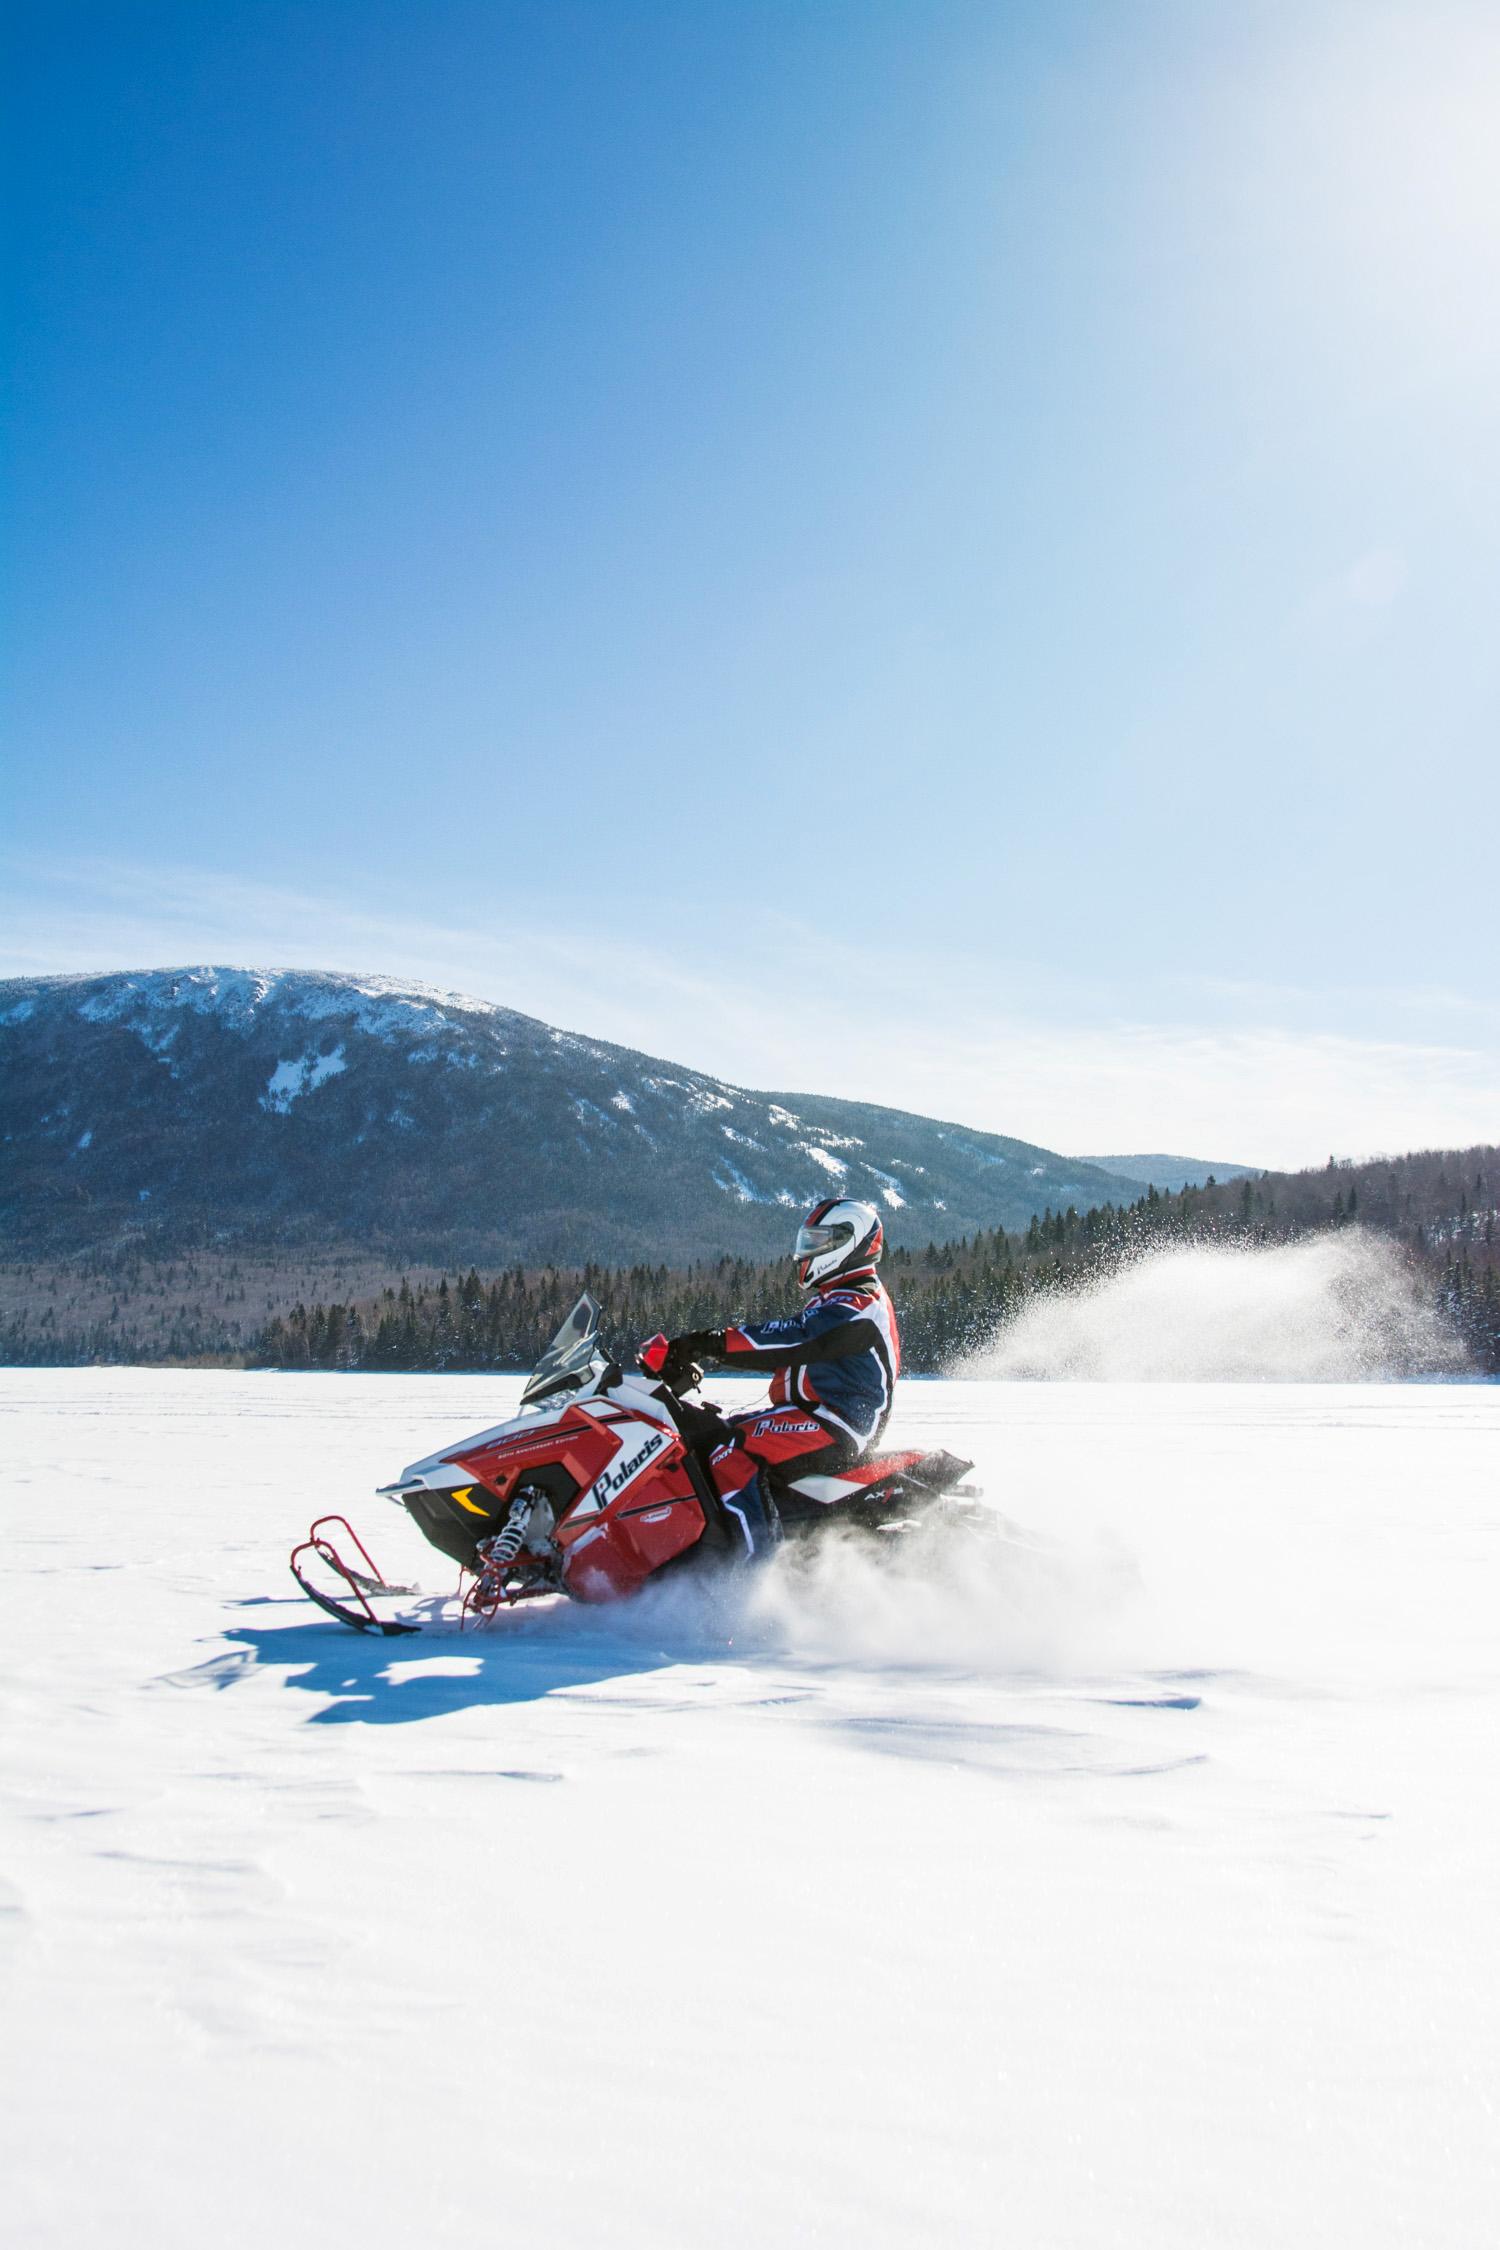 feb10-11 2015-Tourism New Brunswick-T4G Kick-winter 2015-New Brunswick Great Northern Odyssey-snowmobile trip-Mount Carleton-NB-photo by Aaron McKenzie Fraser-www.amfraser.com-_AMF4742.jpg